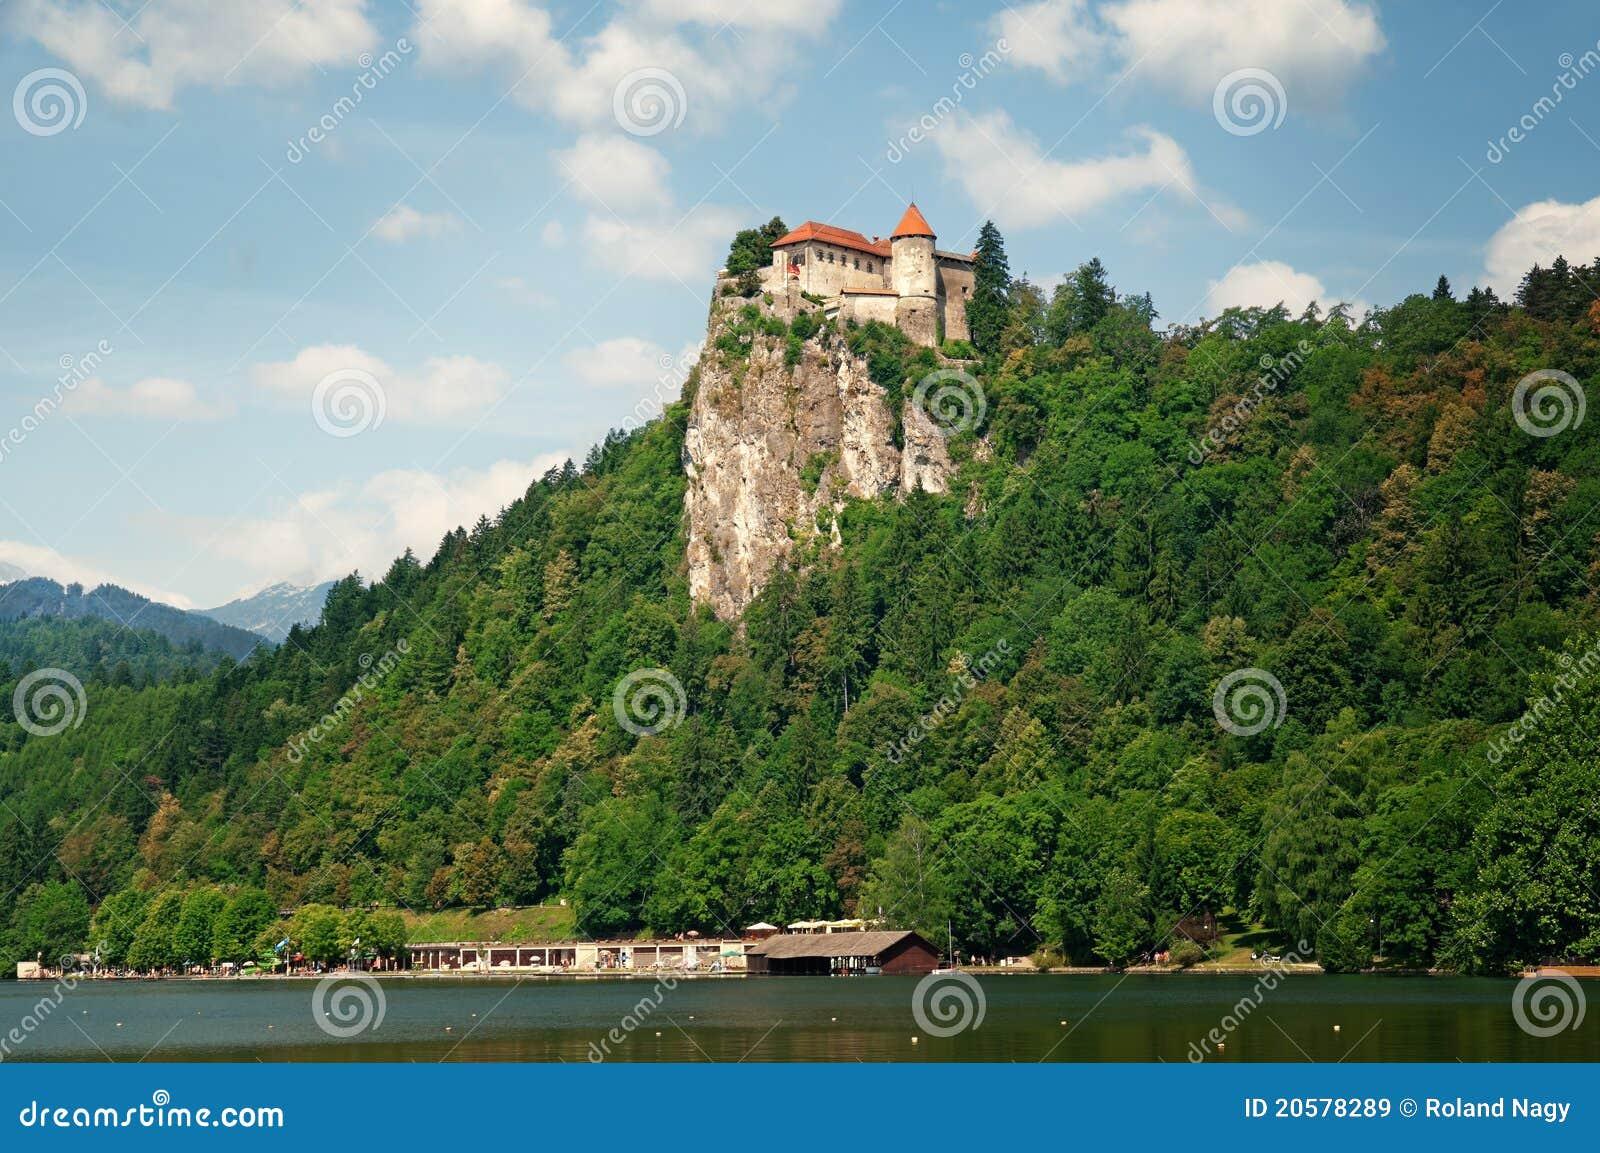 Verlaufene Kaste, Slowenien